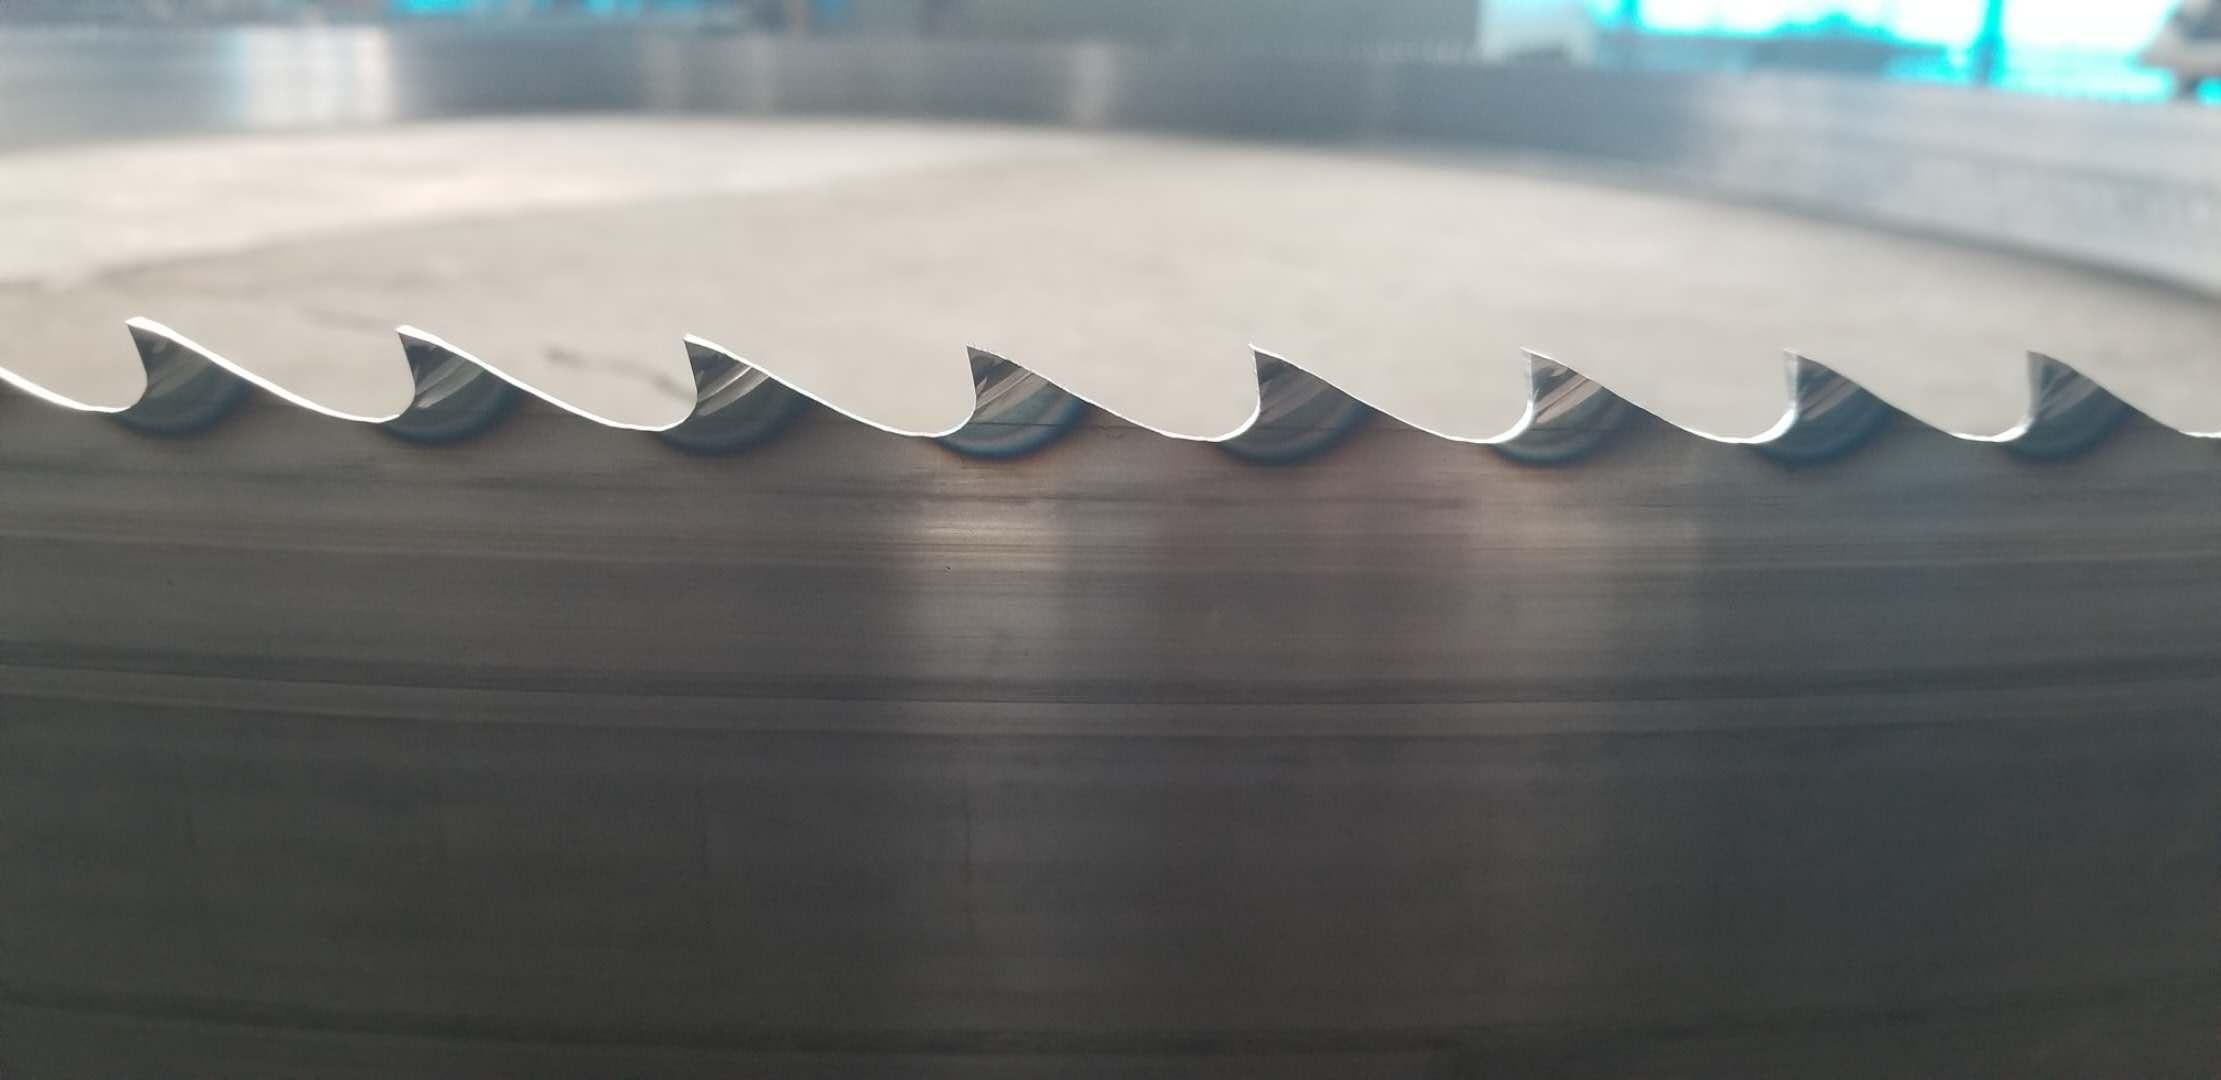 Stellite alloy band saw blade